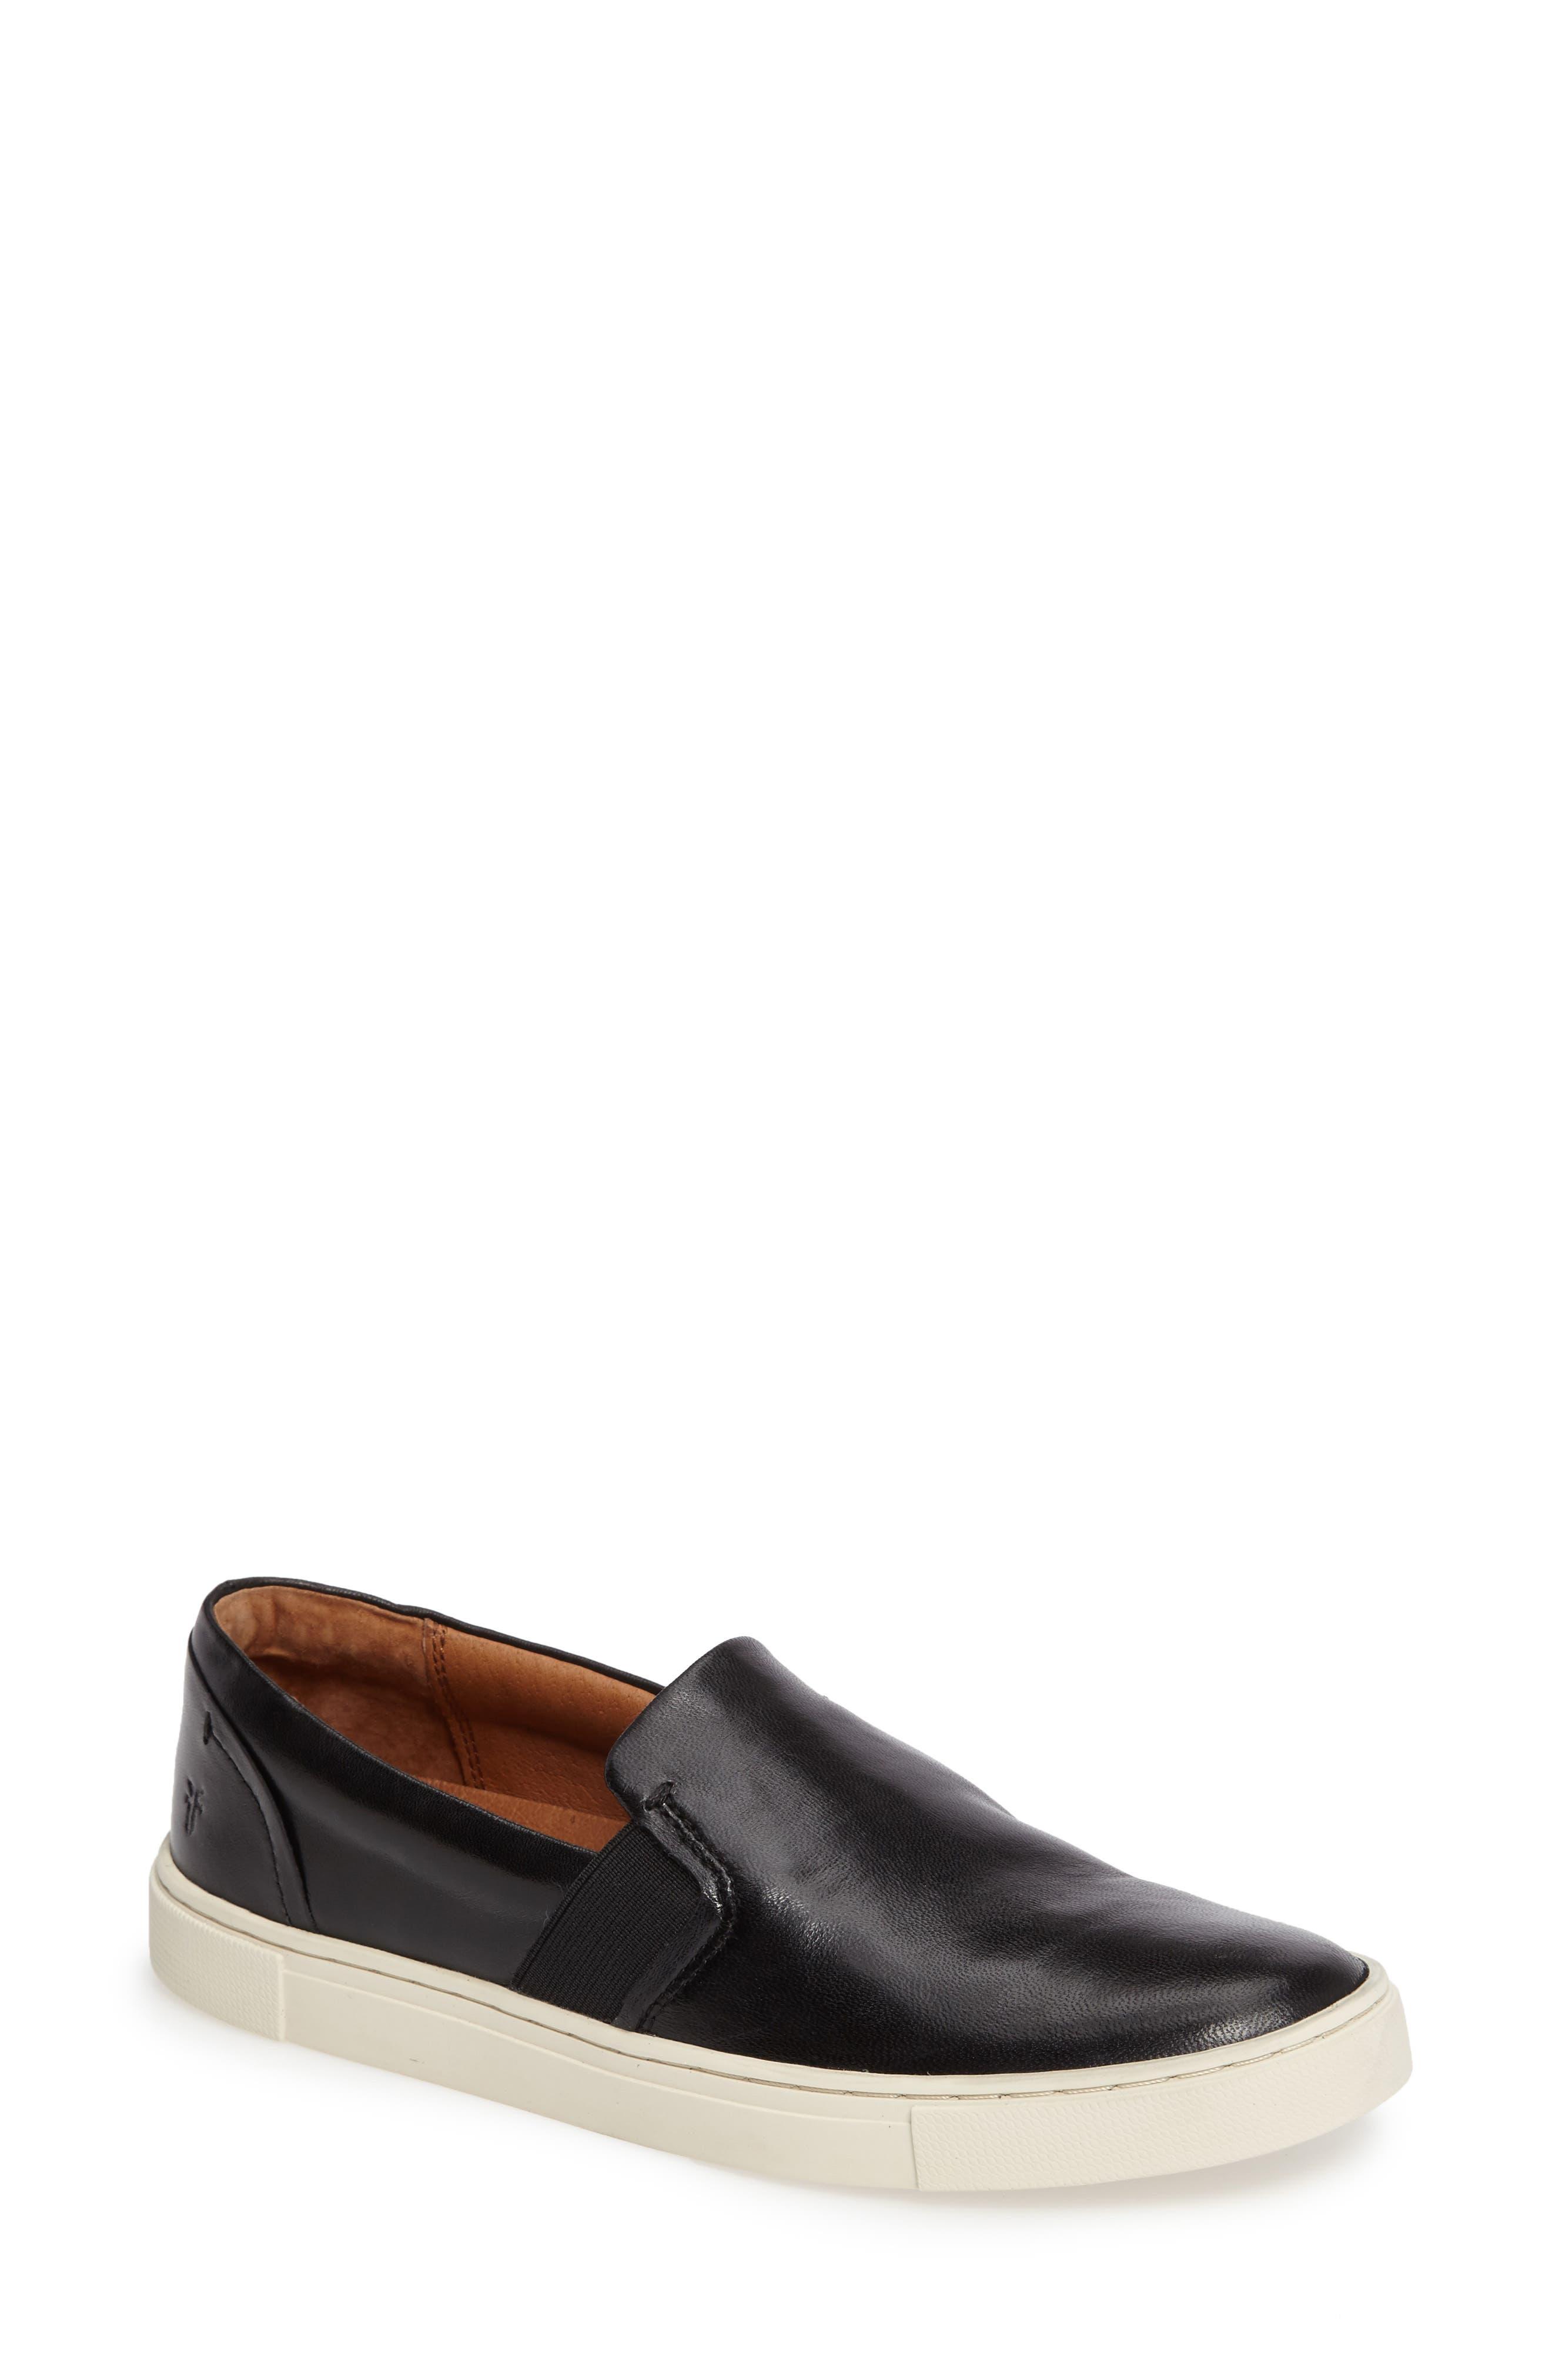 FRYE Ivy Slip-On Sneaker, Main, color, BLACK/ BLACK